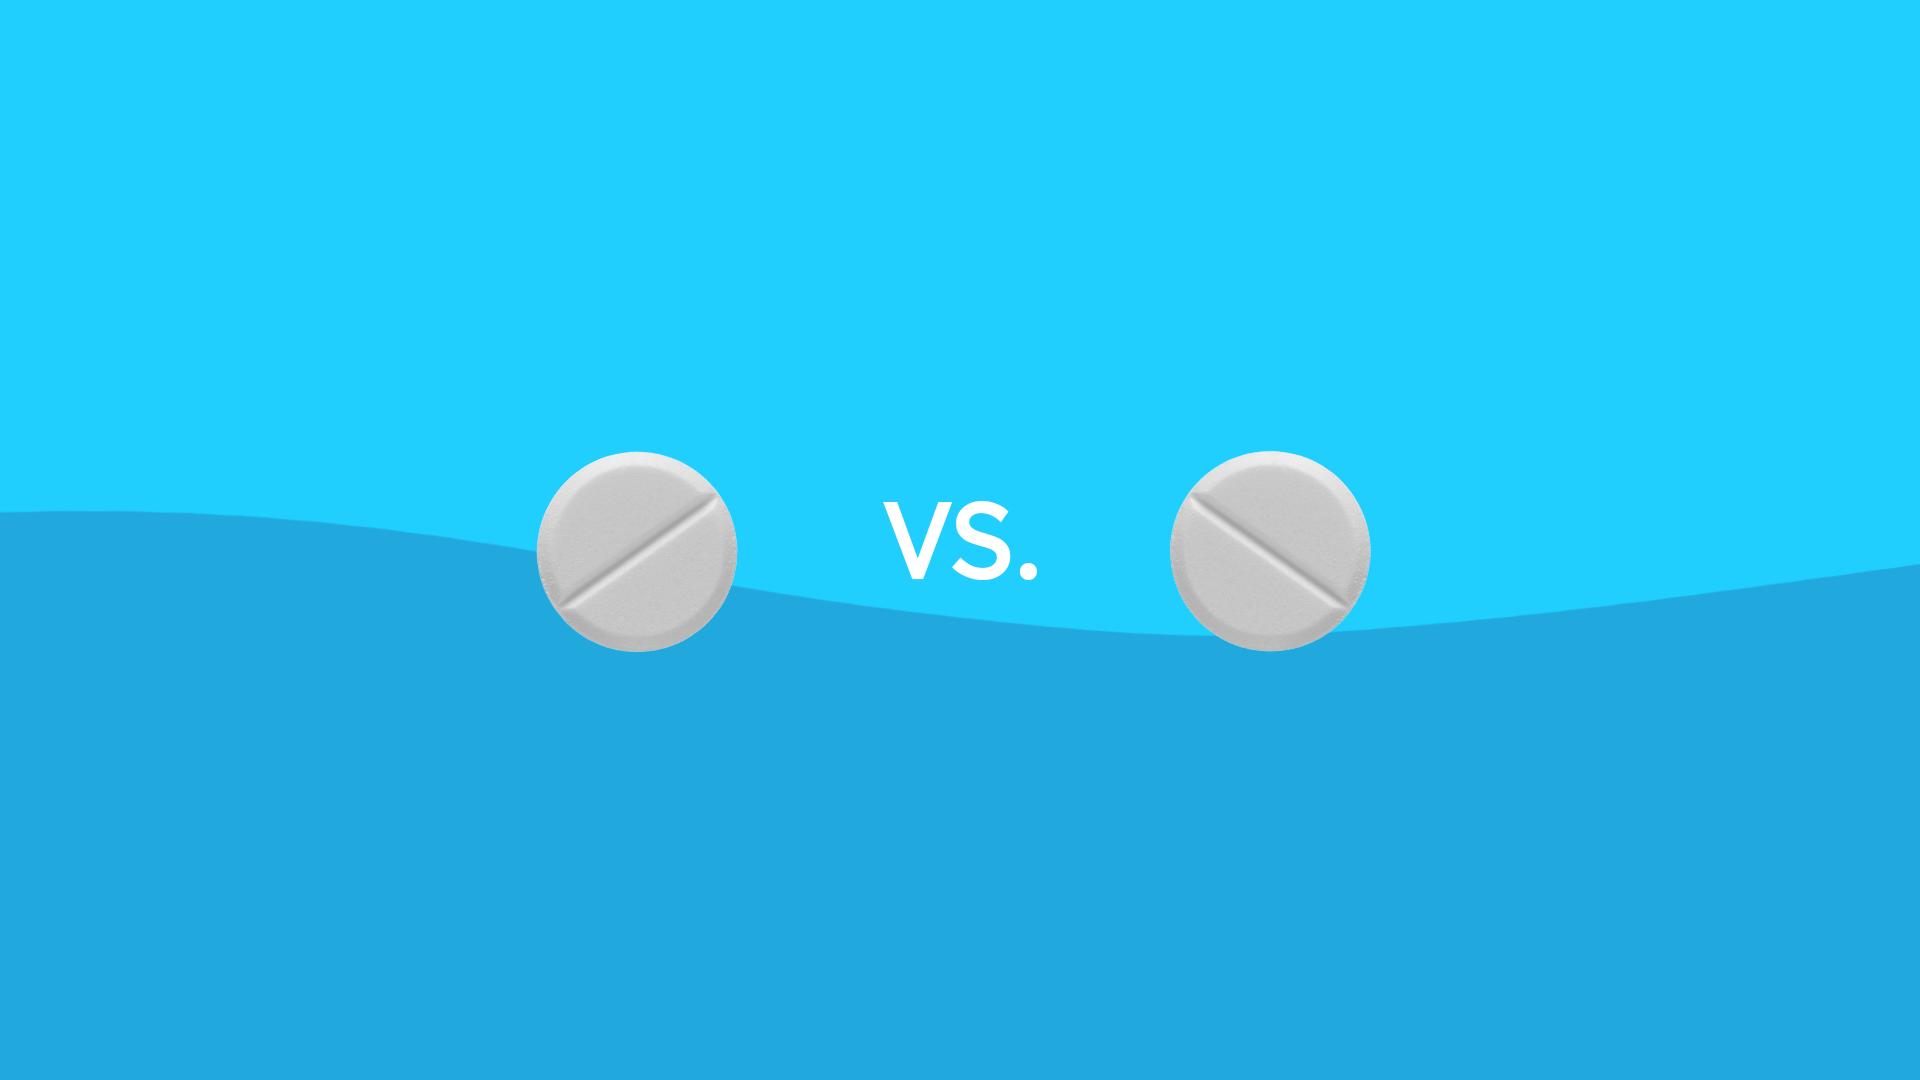 Zantac vs. Prilosec: Main Differences and Similarities